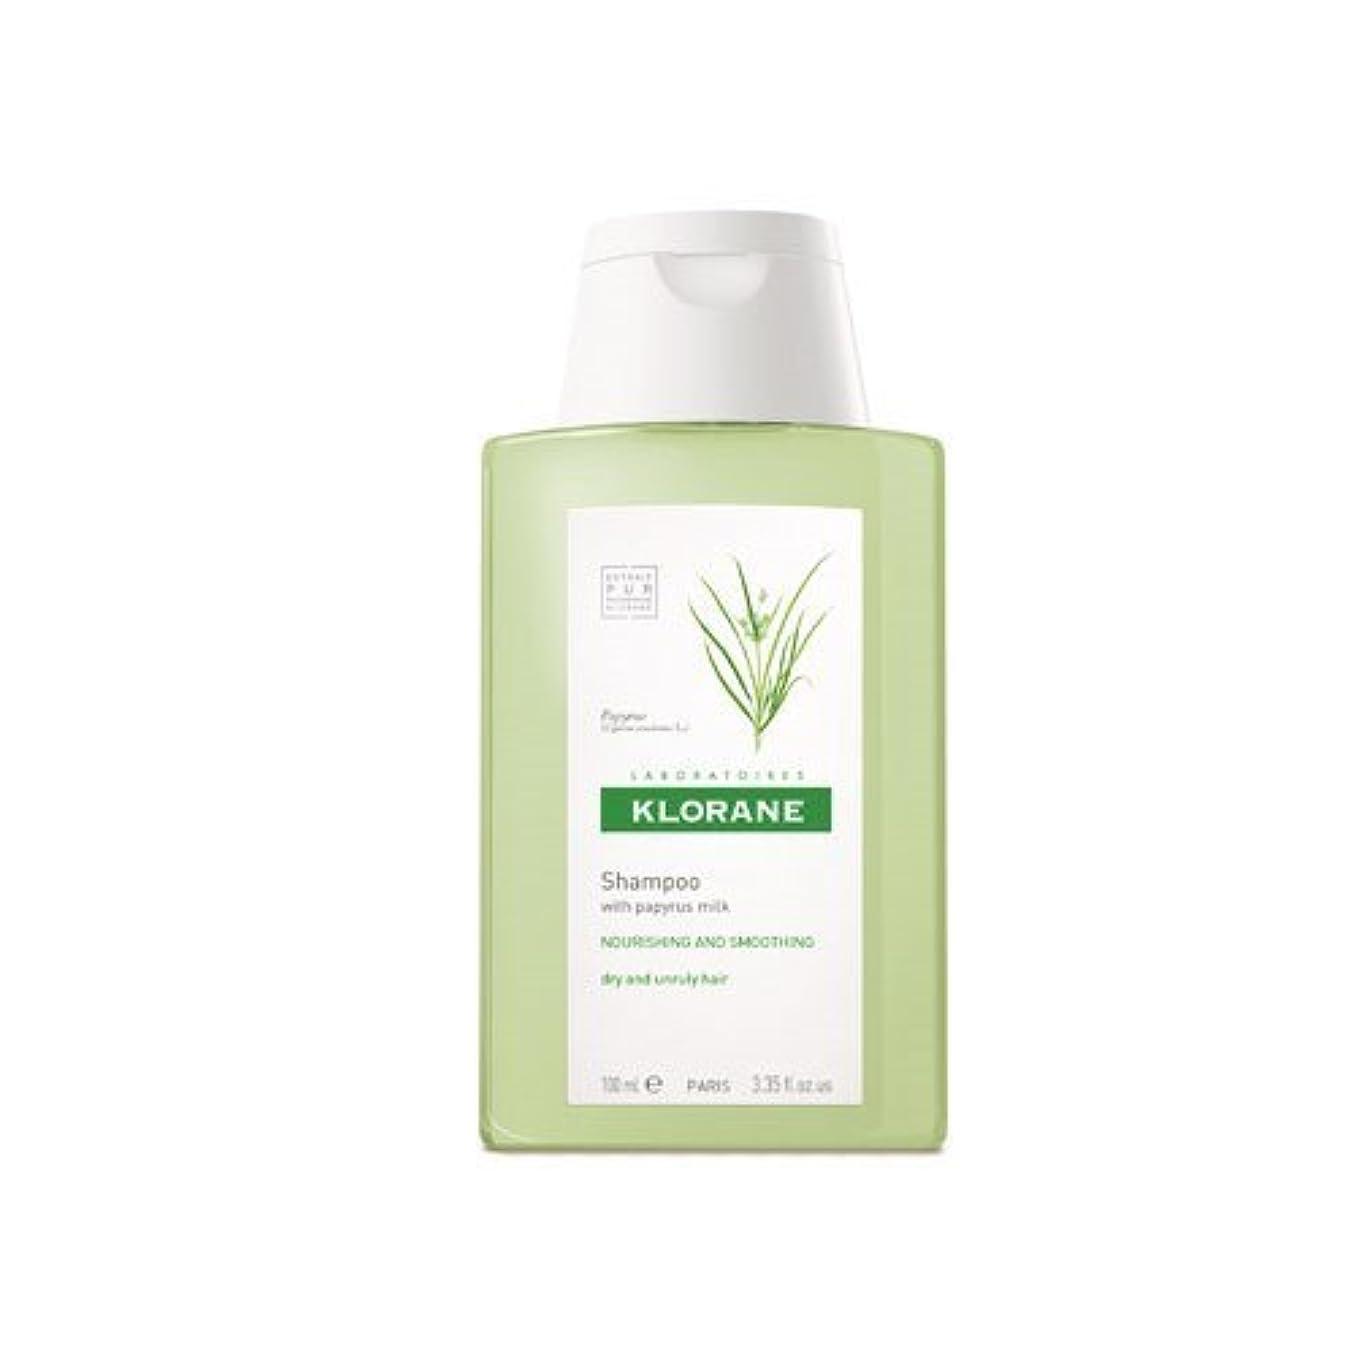 Klorane Shampoo with Papyrus Milk, 3.35 oz Travel Size by Klorane [並行輸入品]